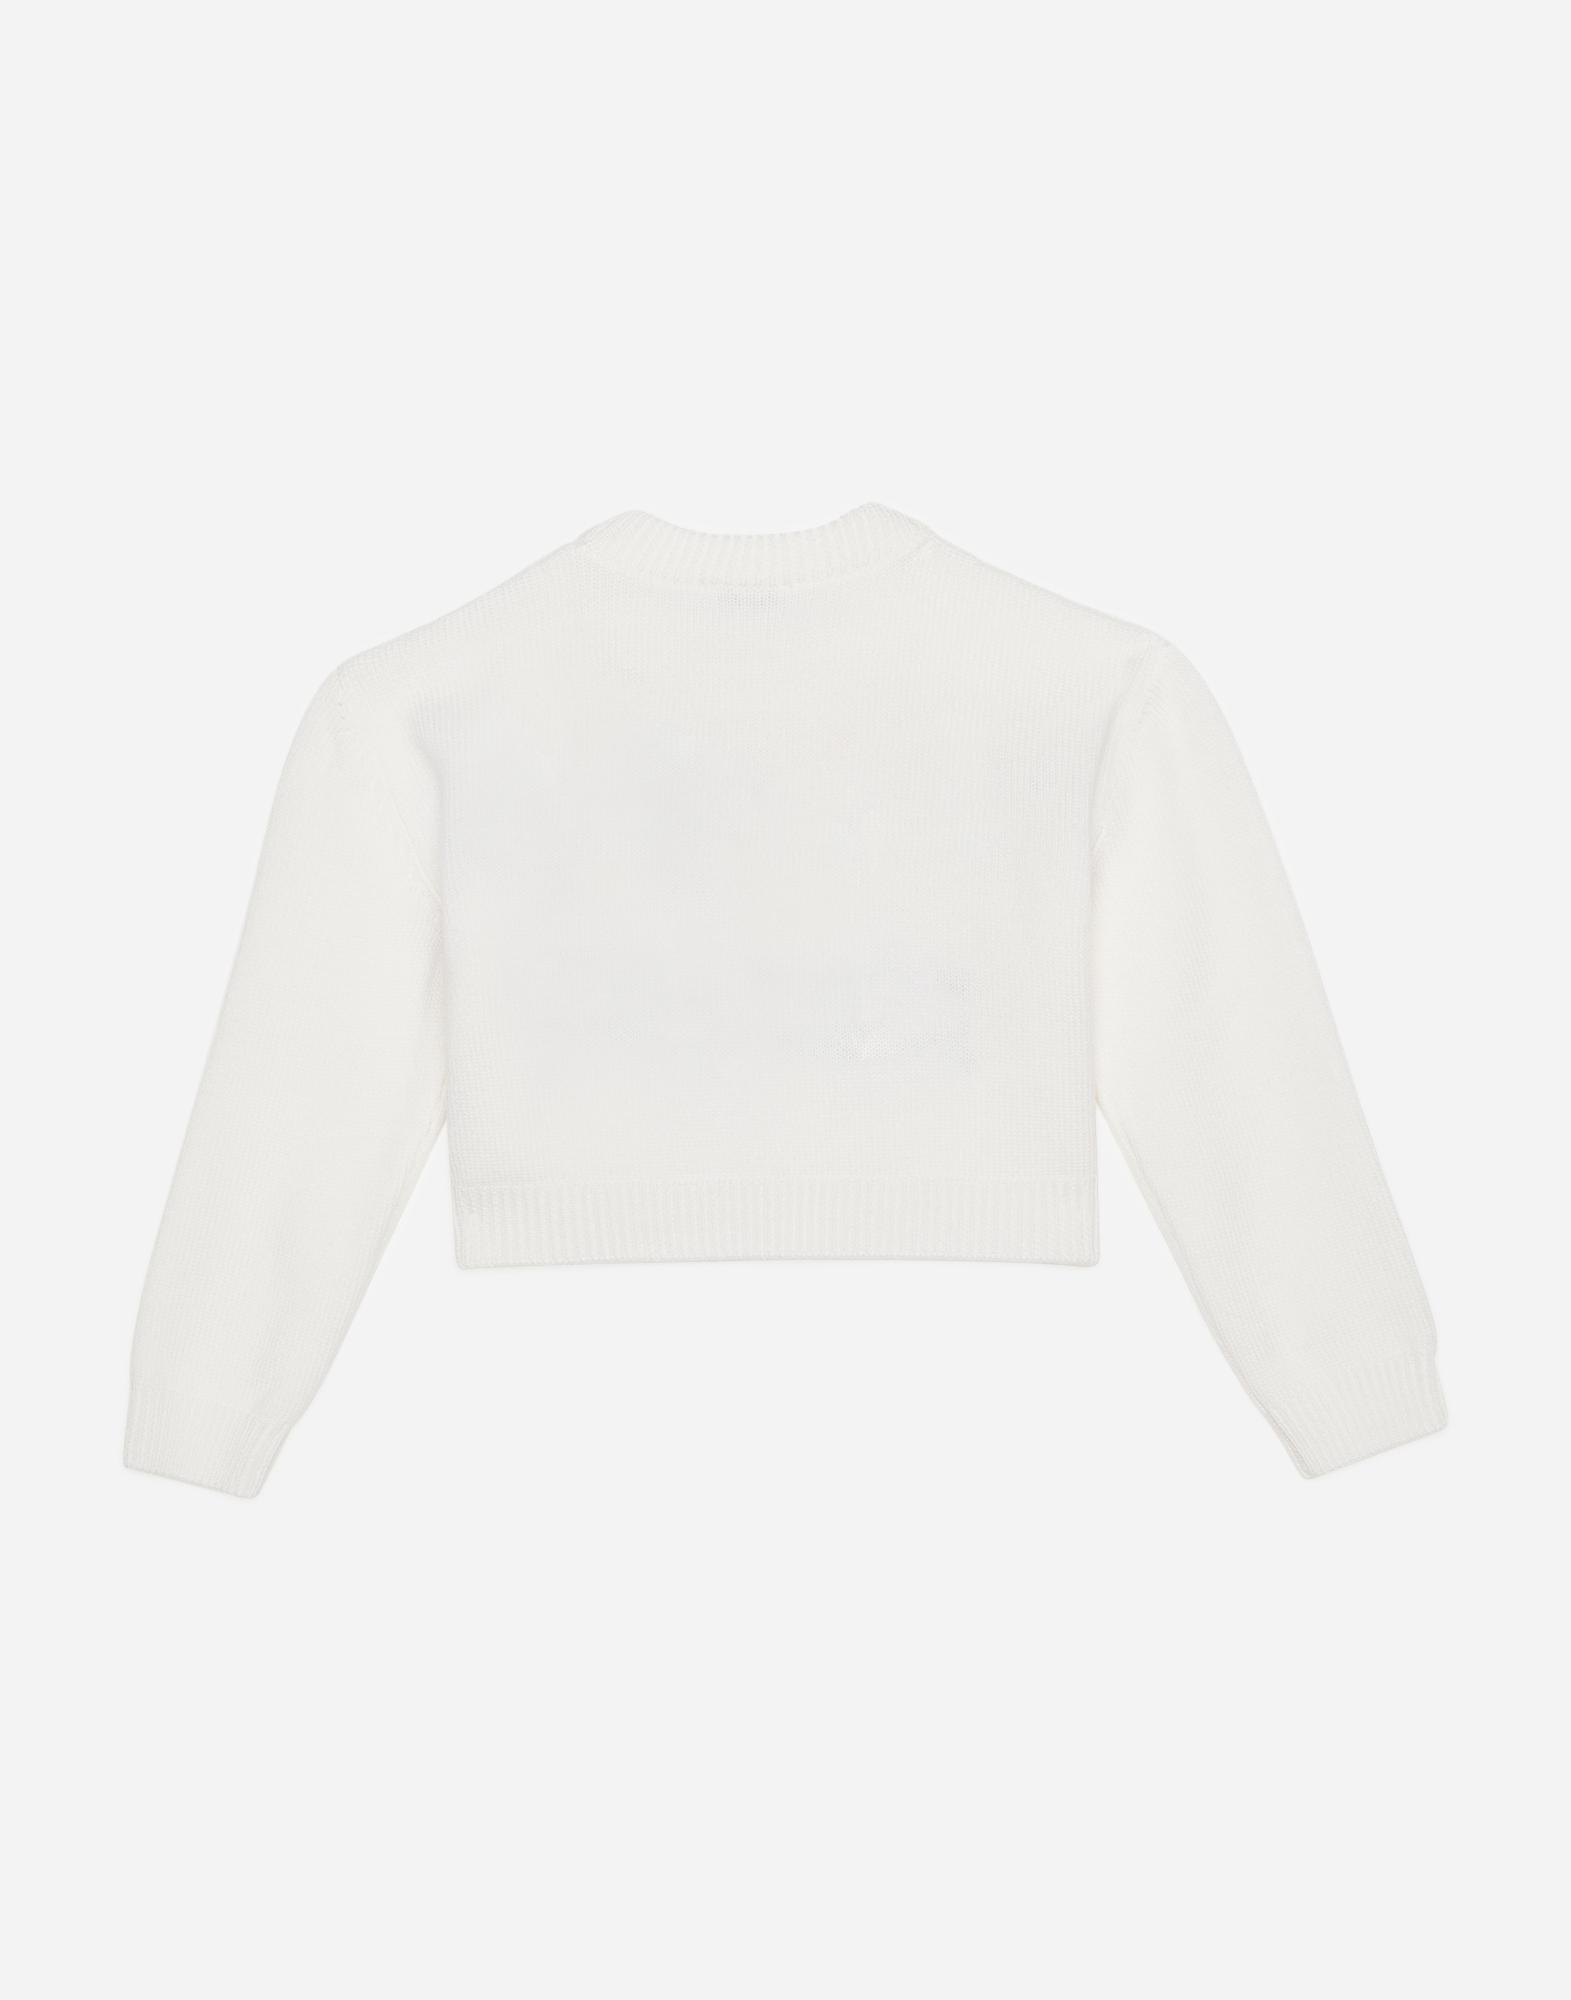 Dolce & Gabbana CREW NECK SWEATER WITH INLAY